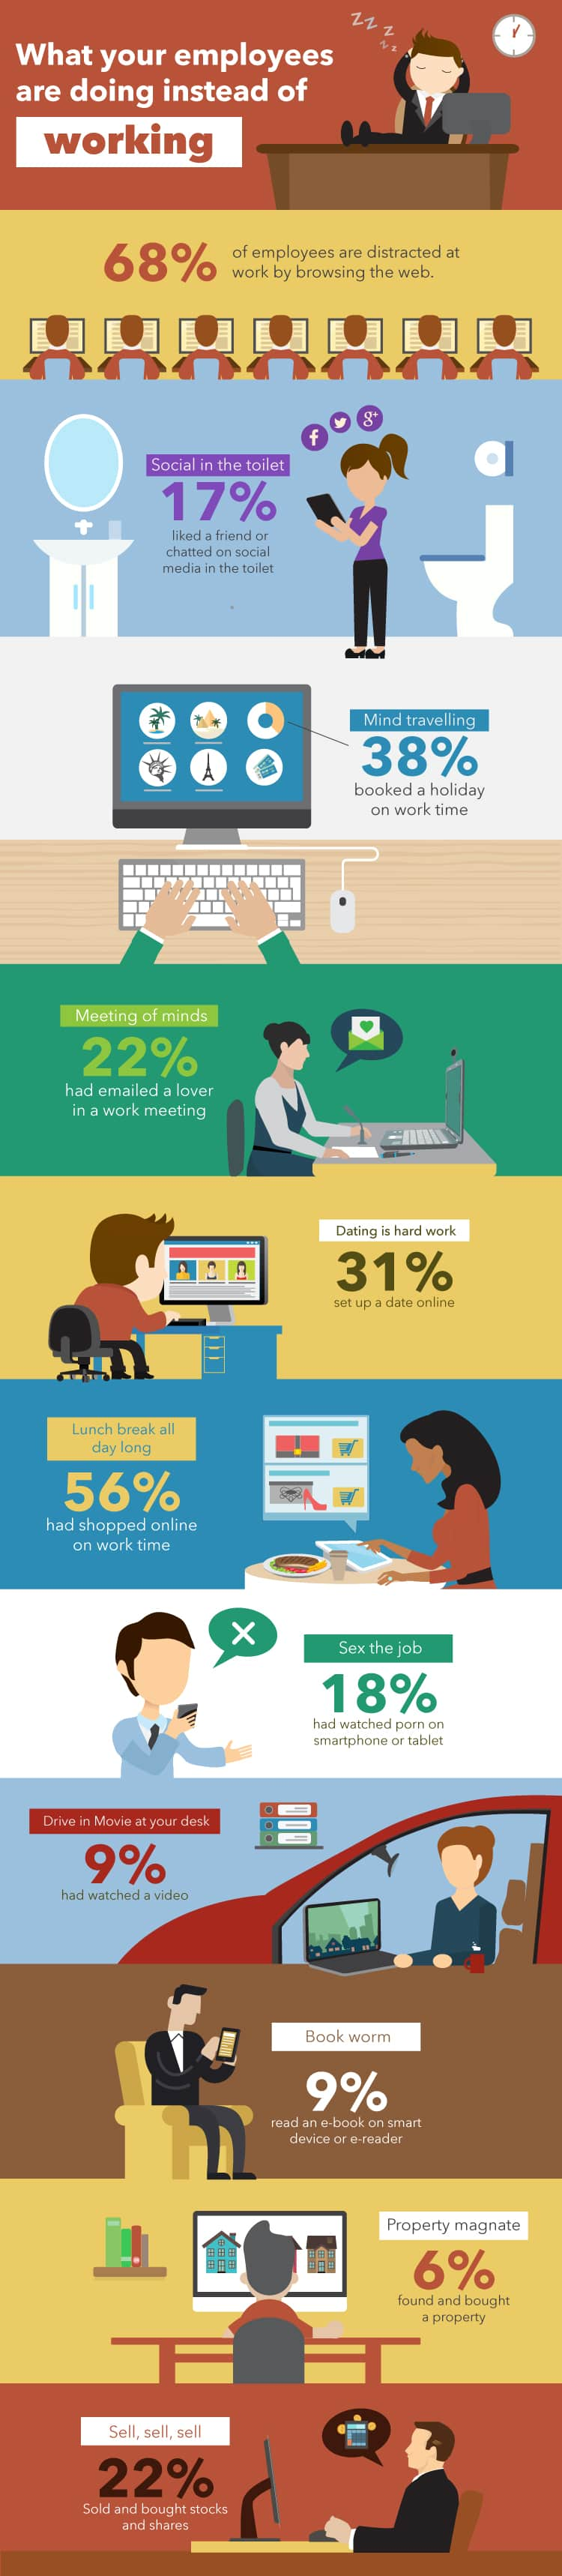 procrastination-infographic